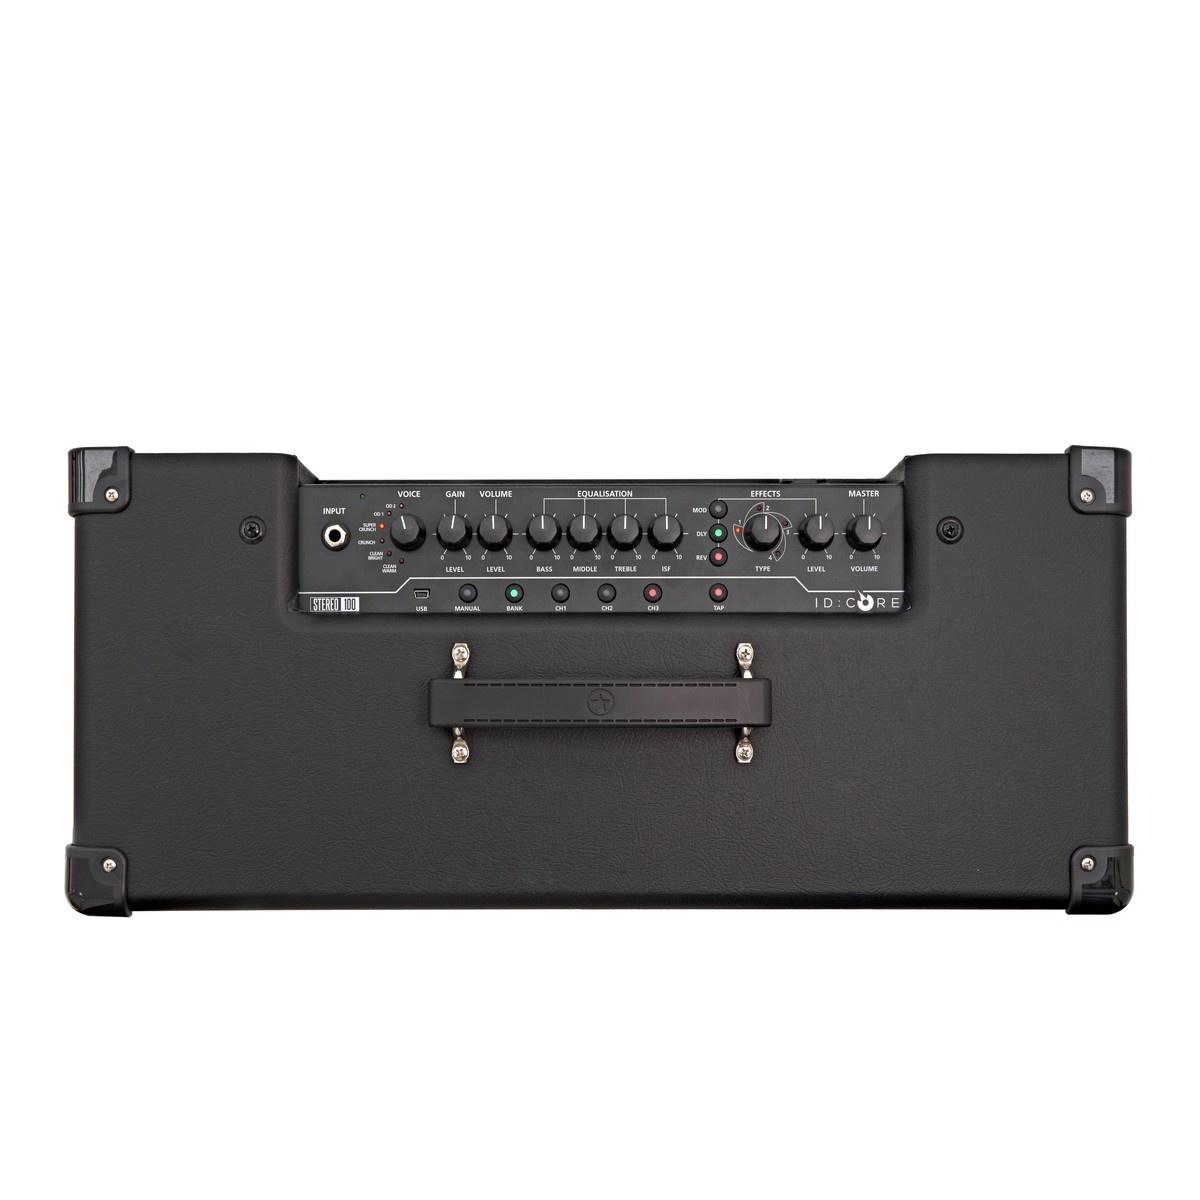 Blackstar Blackstar ID Core Stereo 100